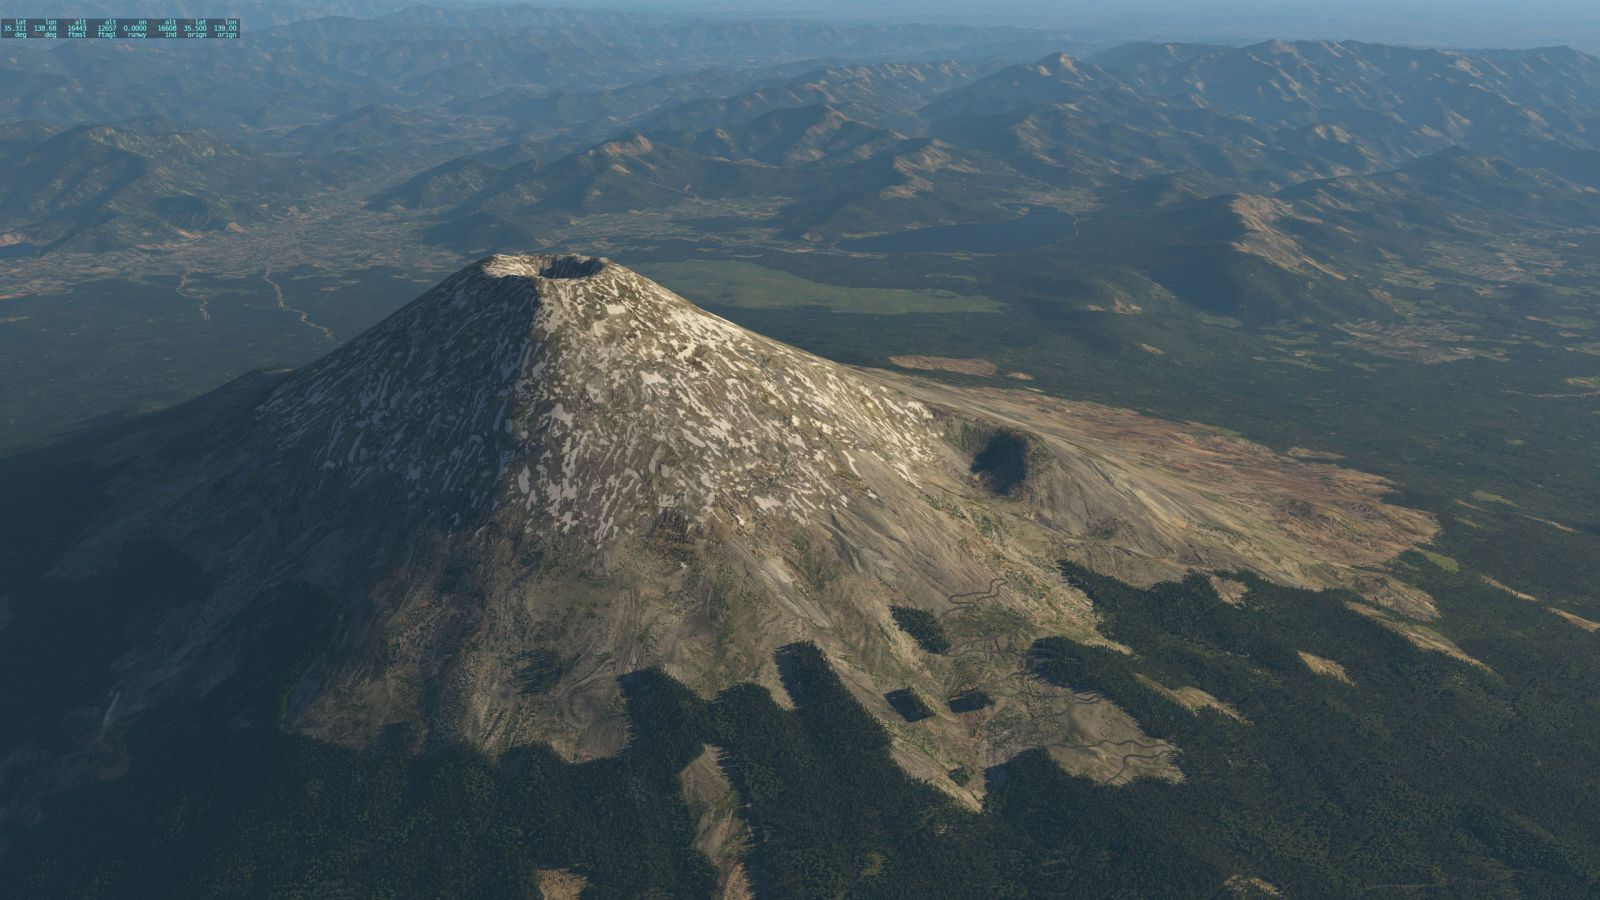 HD Mesh Scenery v4 Downloads for X-Plane 11